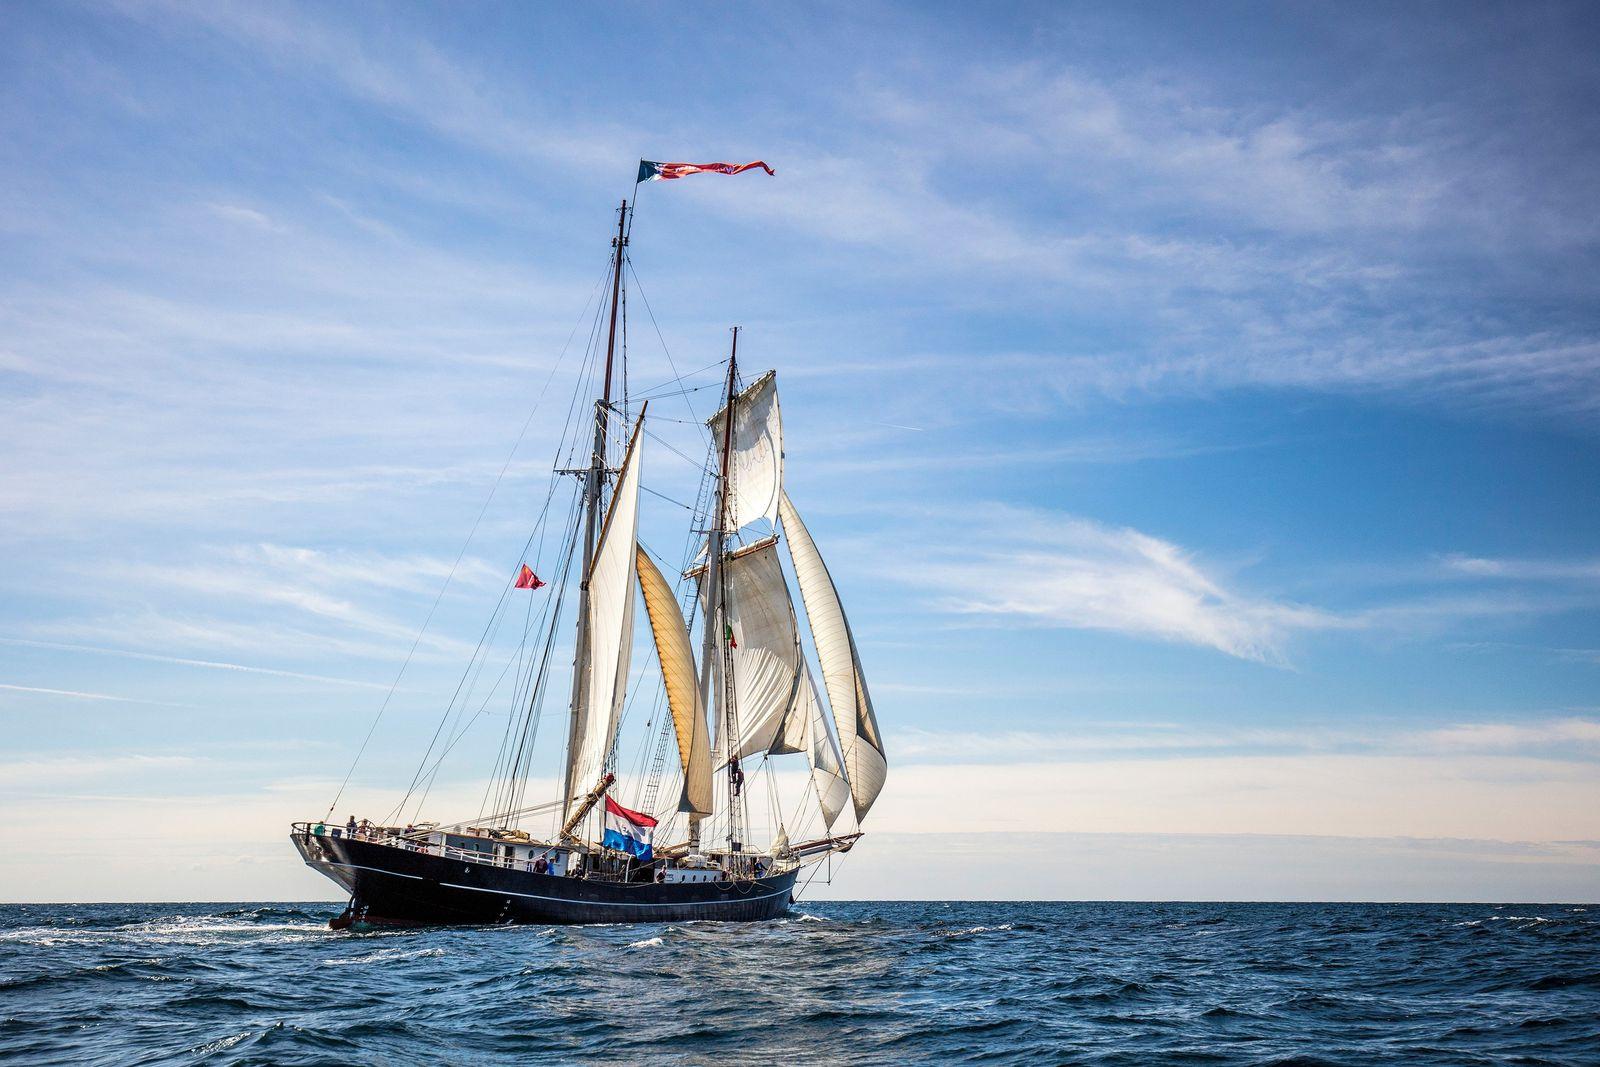 Corona zwingt Schüler aufs Meer: Heimfahrt mit Segelschiff